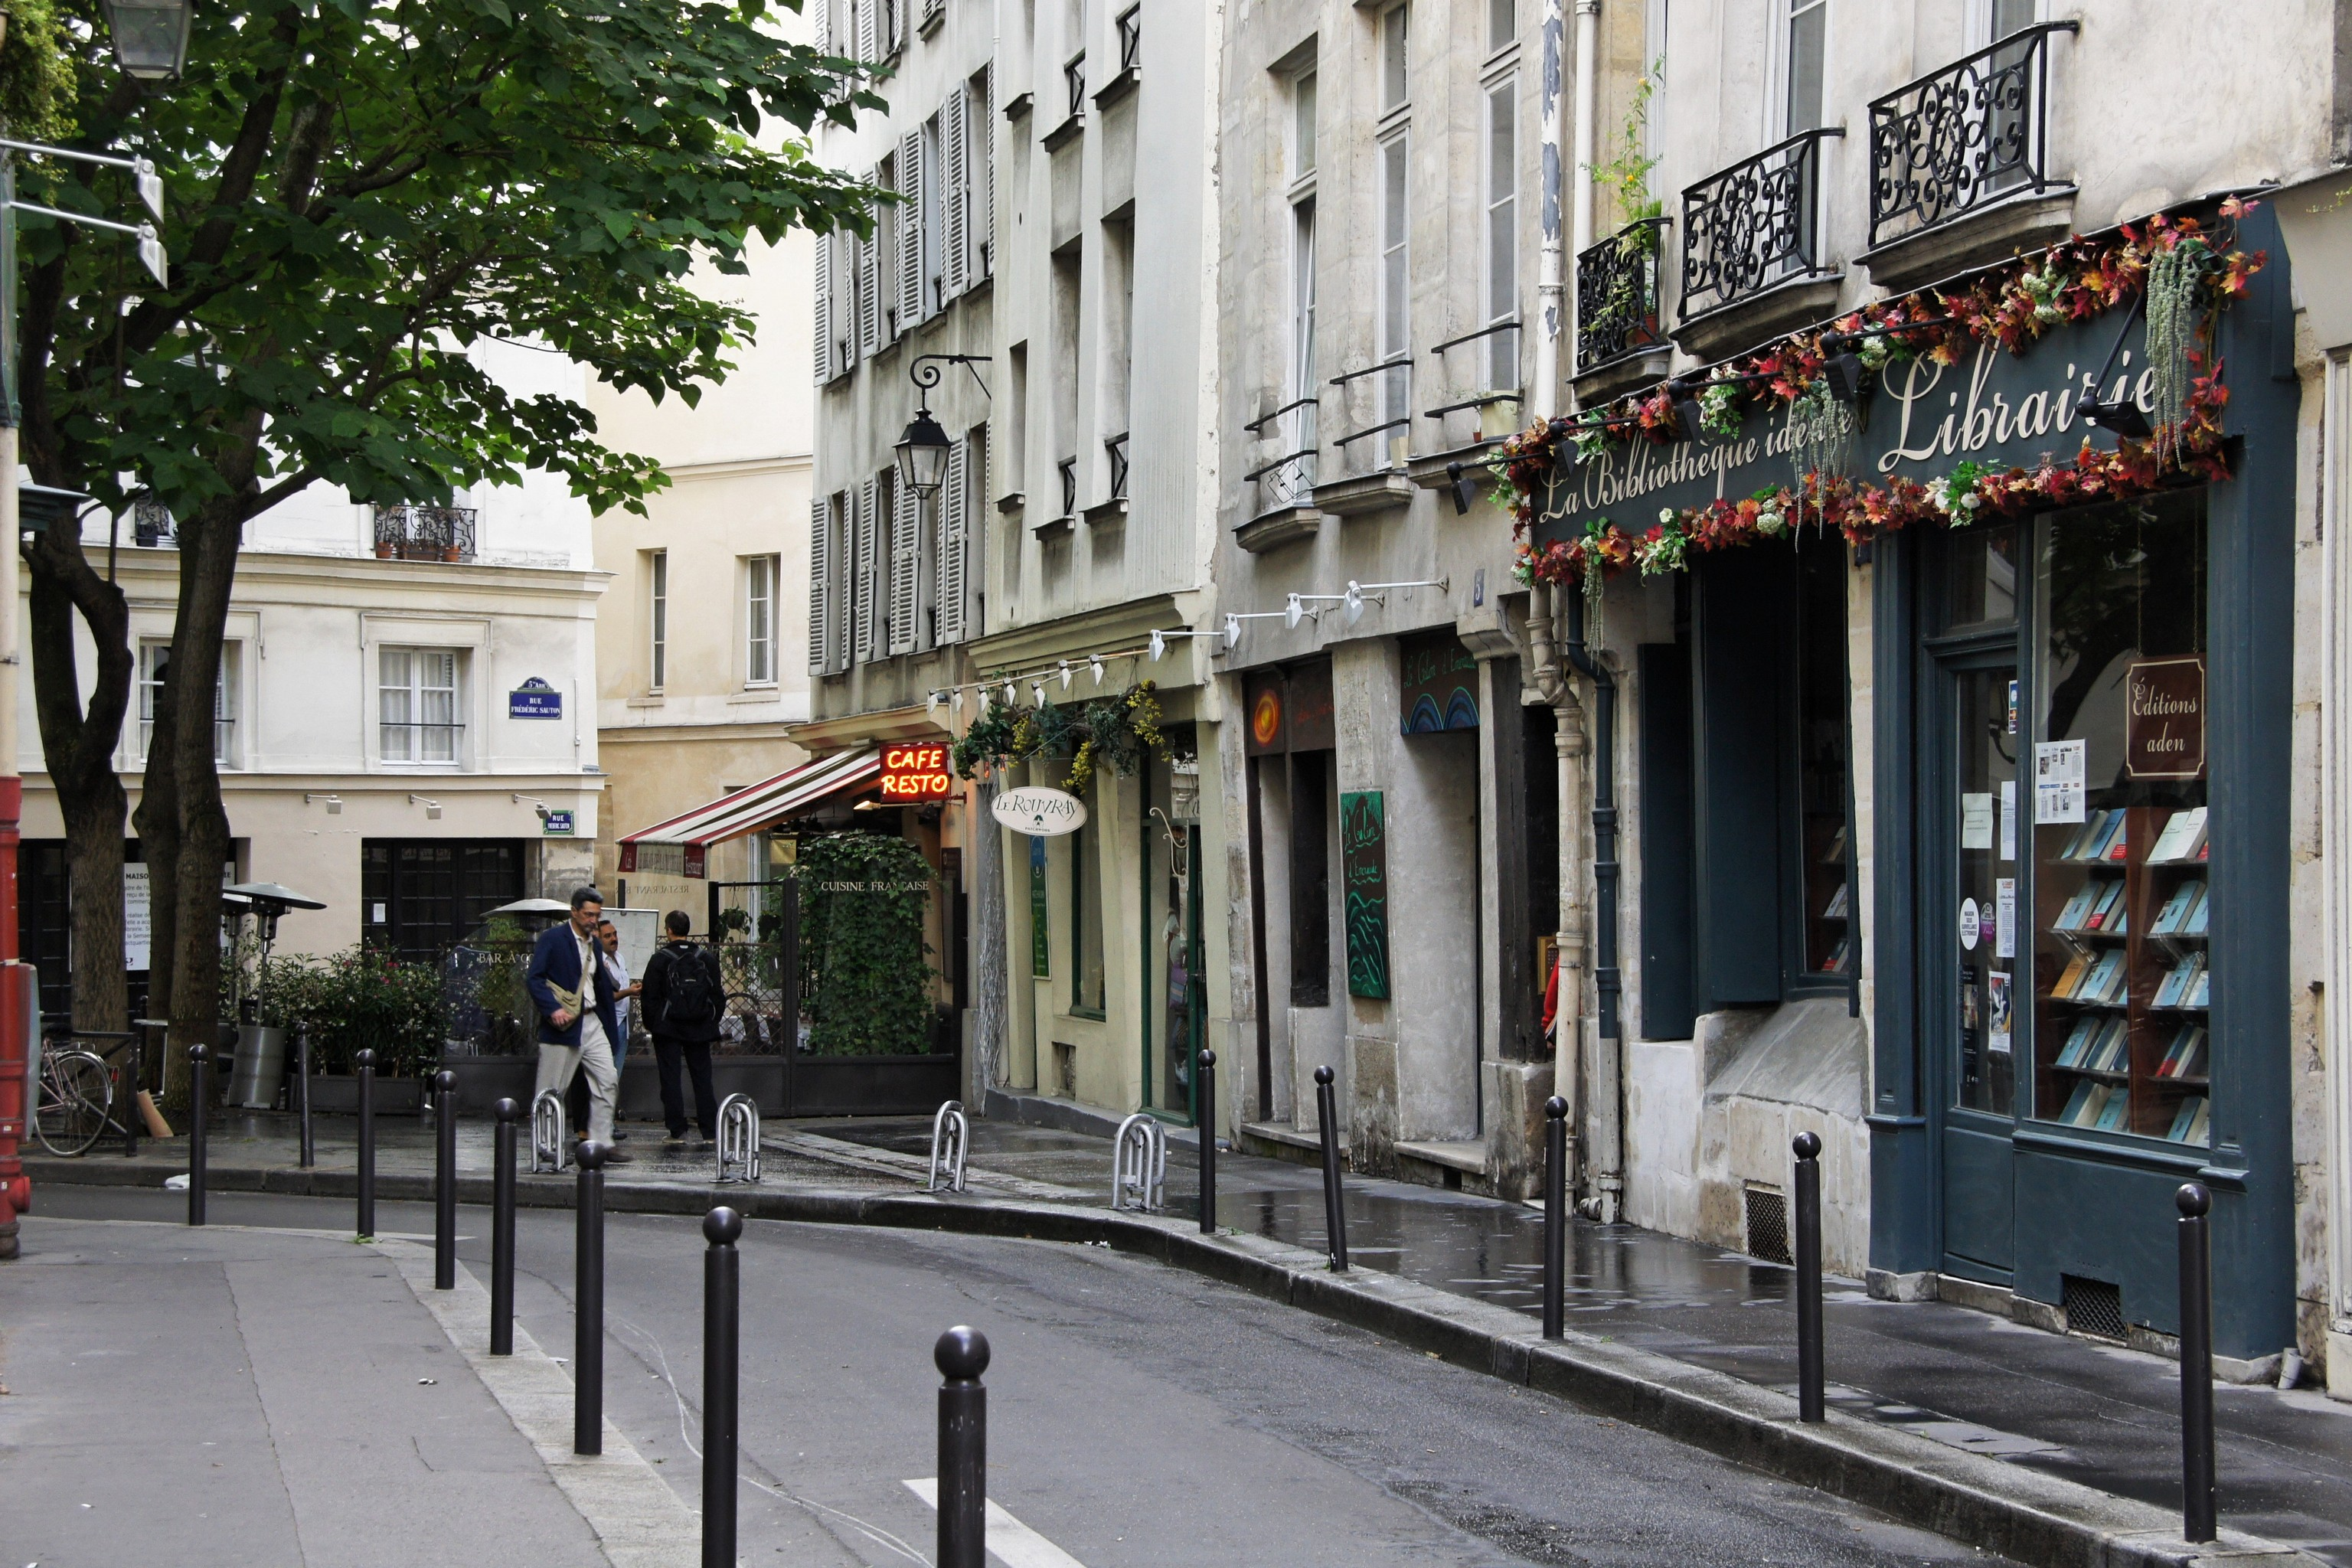 File:La librairie de la rue de la Bucherie.jpg